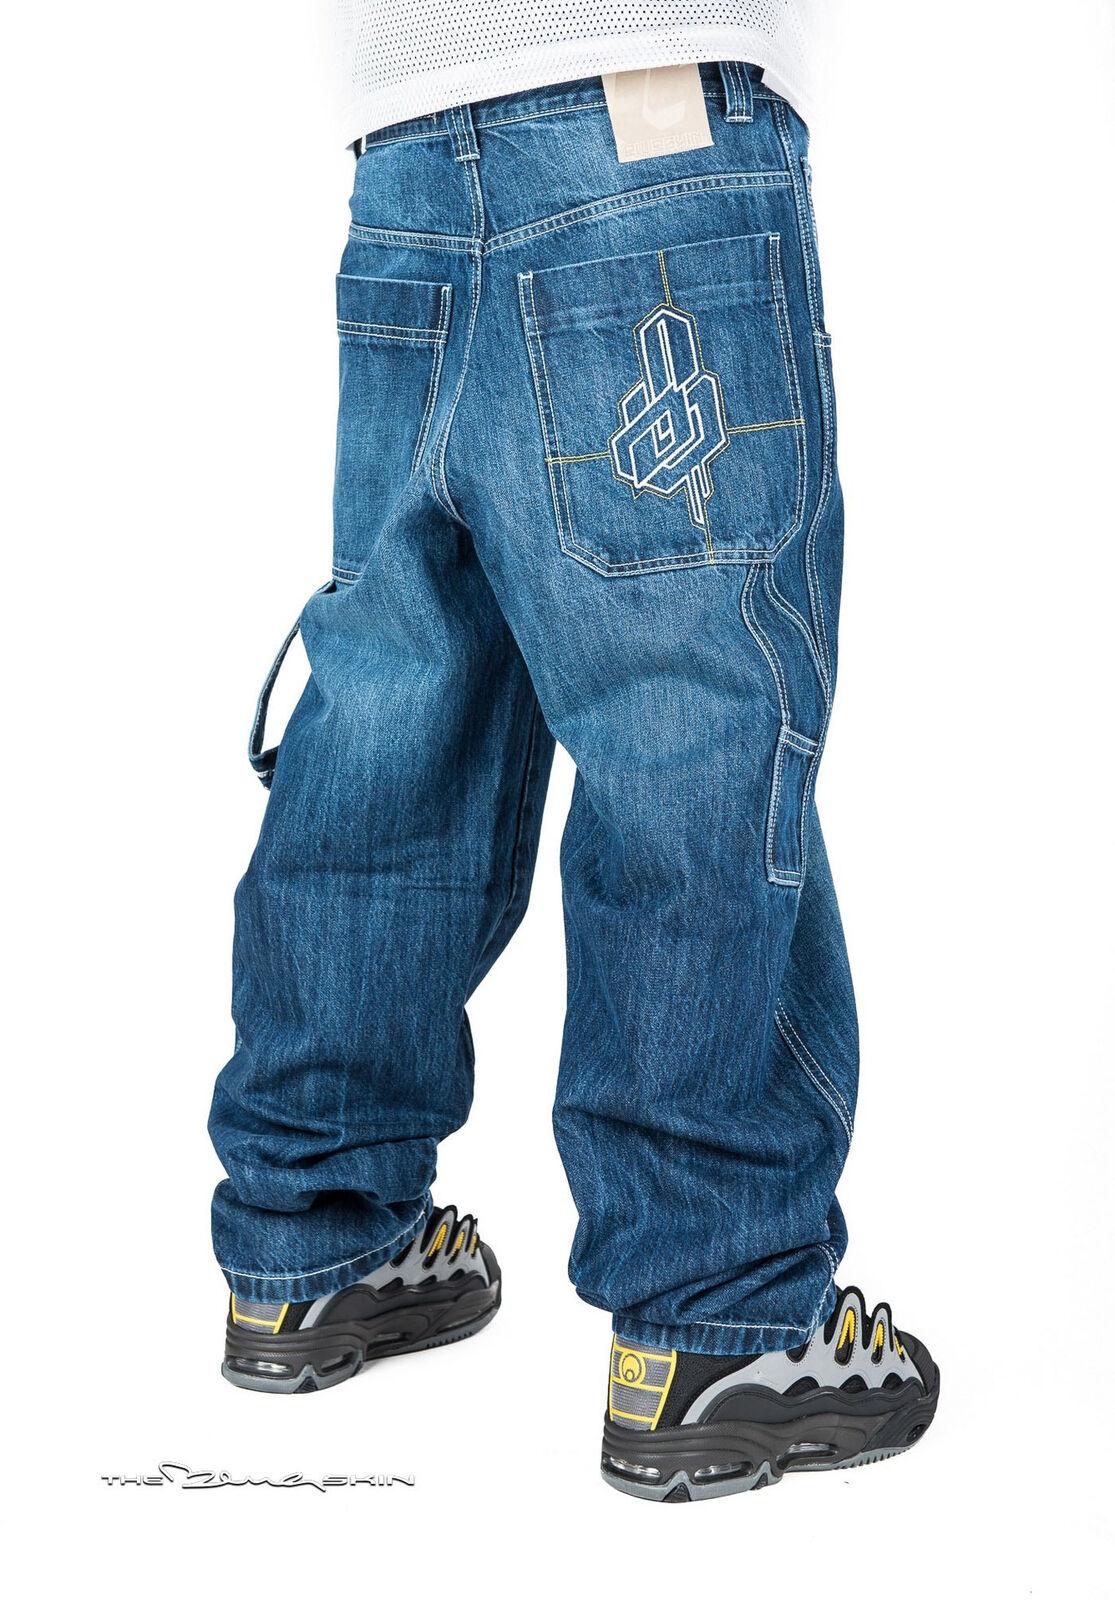 Jeans Hosen Hip-Hop-Skate-Rap THEBlauSKIN bsj37